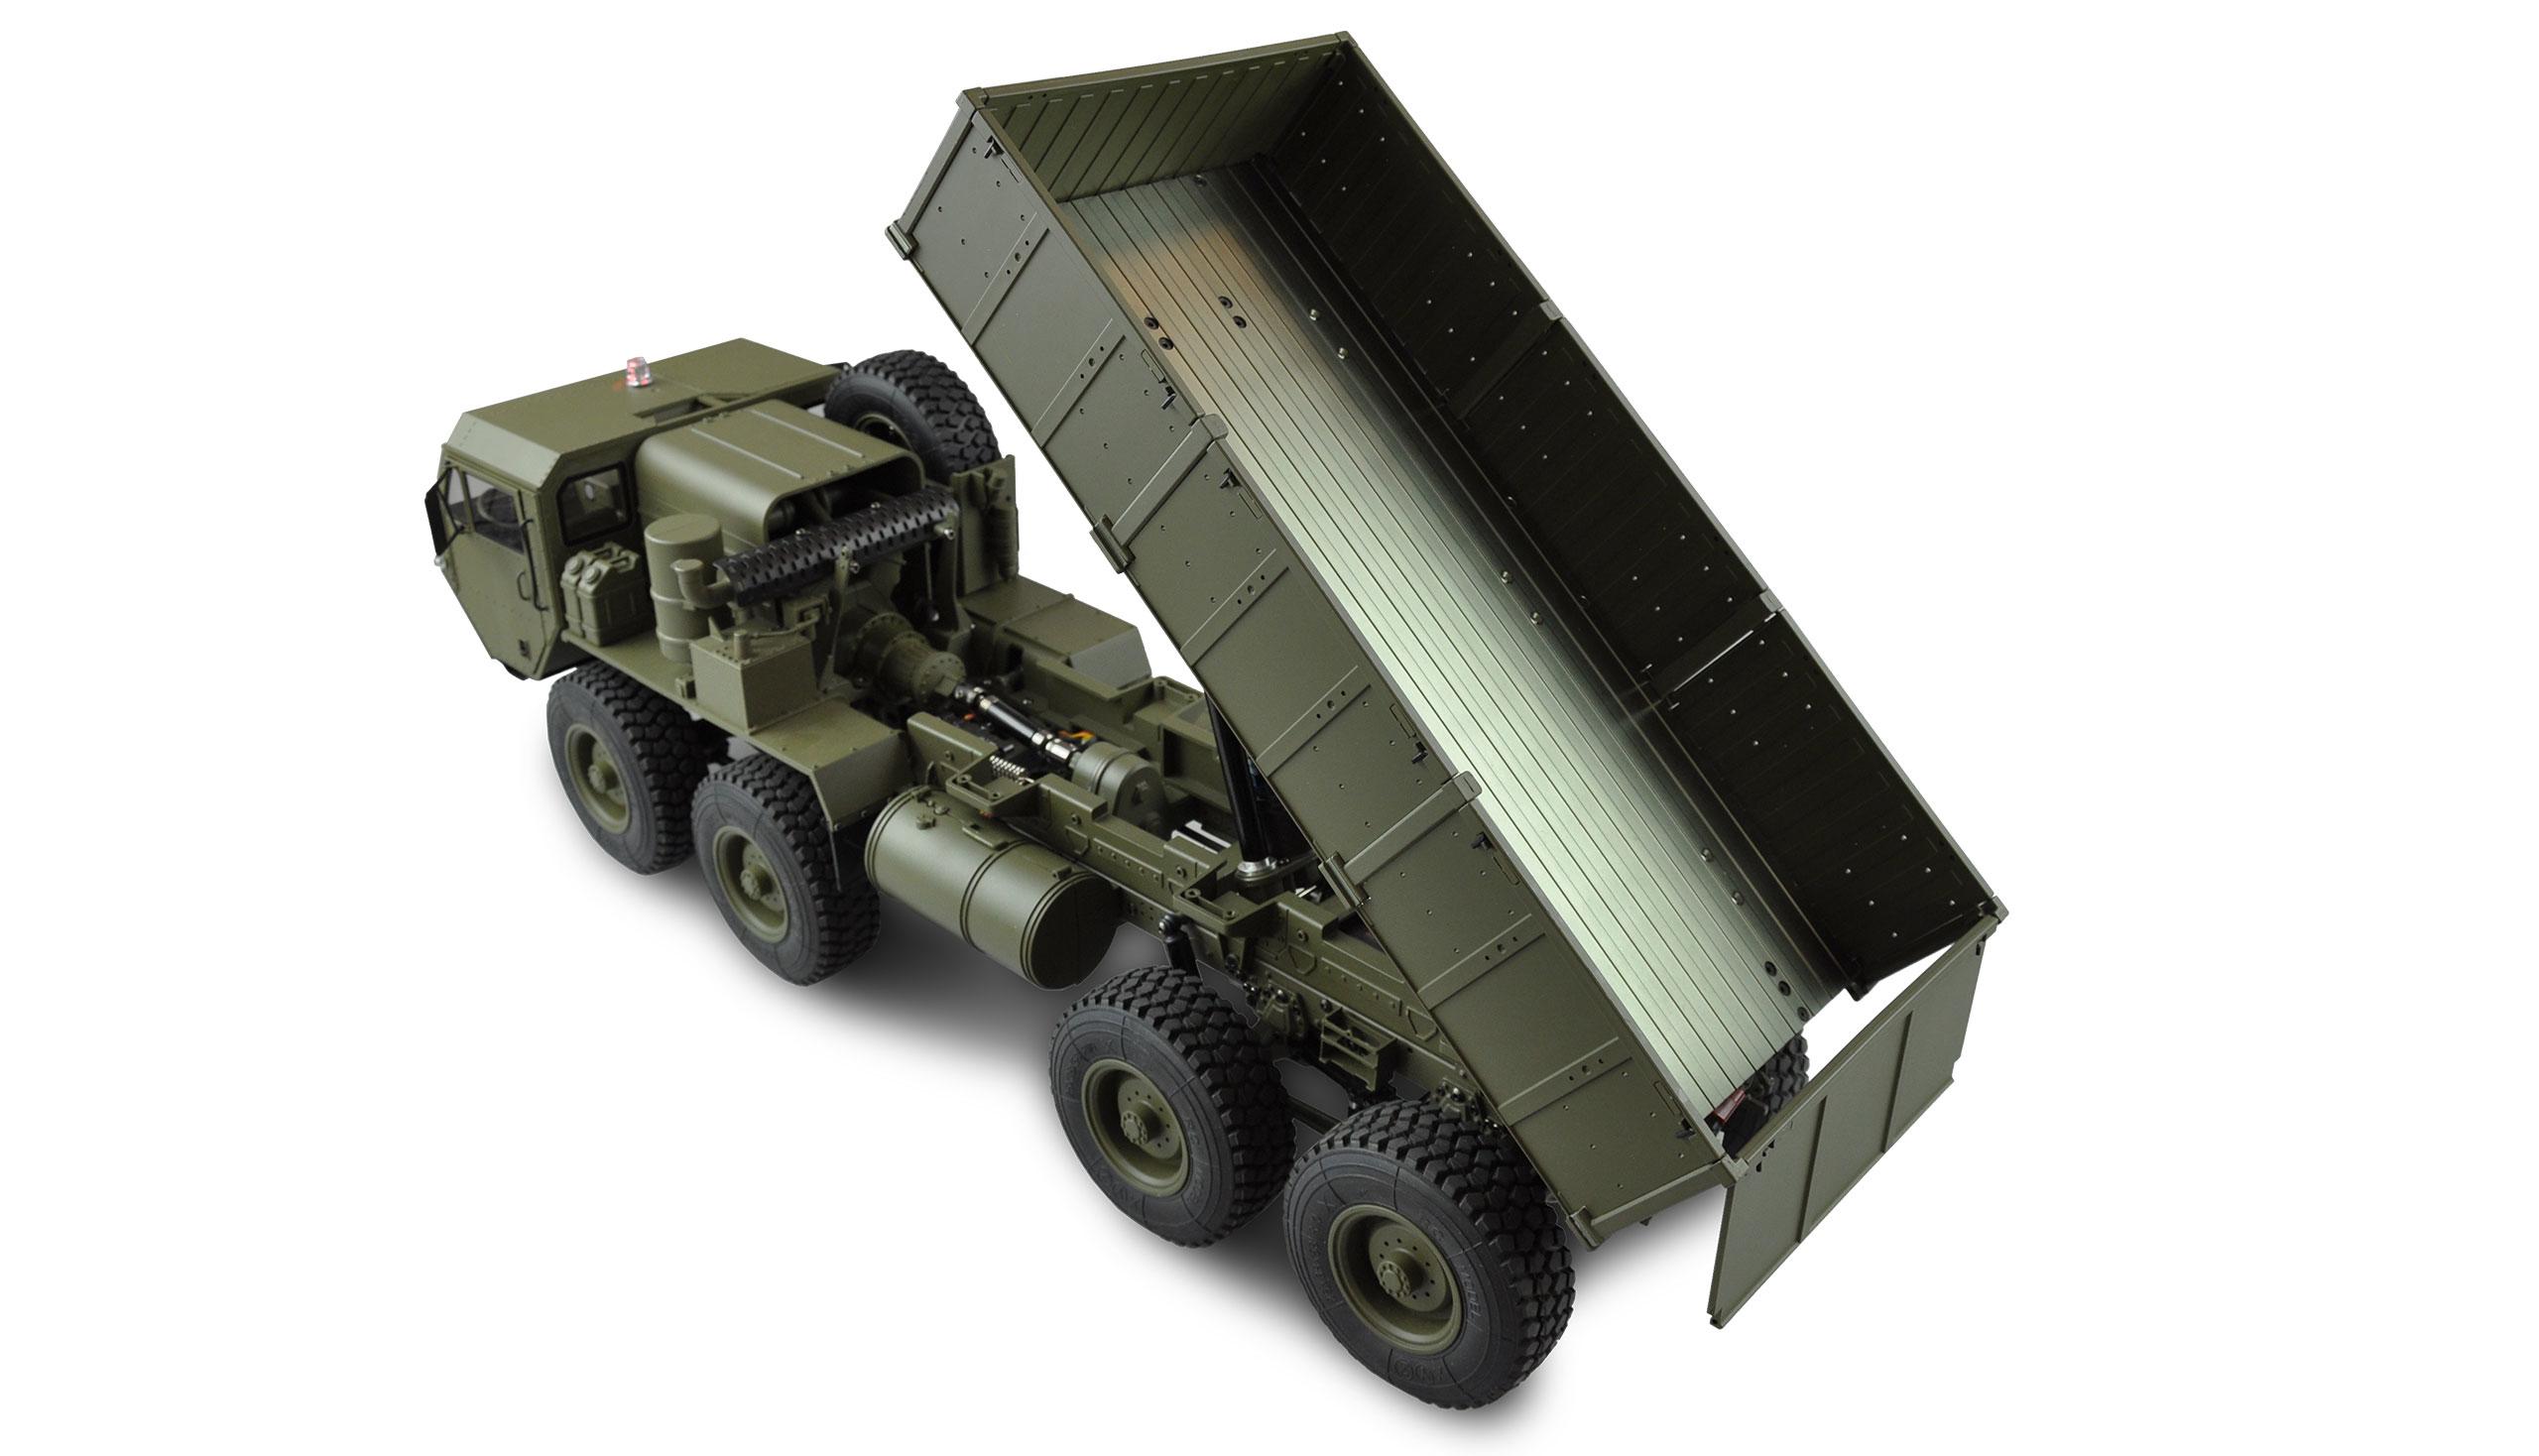 Amewi U.S. Militär Truck 8x8 - Radio-Controlled (RC) truck - Elektromotor - 1:12 - Betriebsbereit (RTR) - Grün - Junge/Mädchen